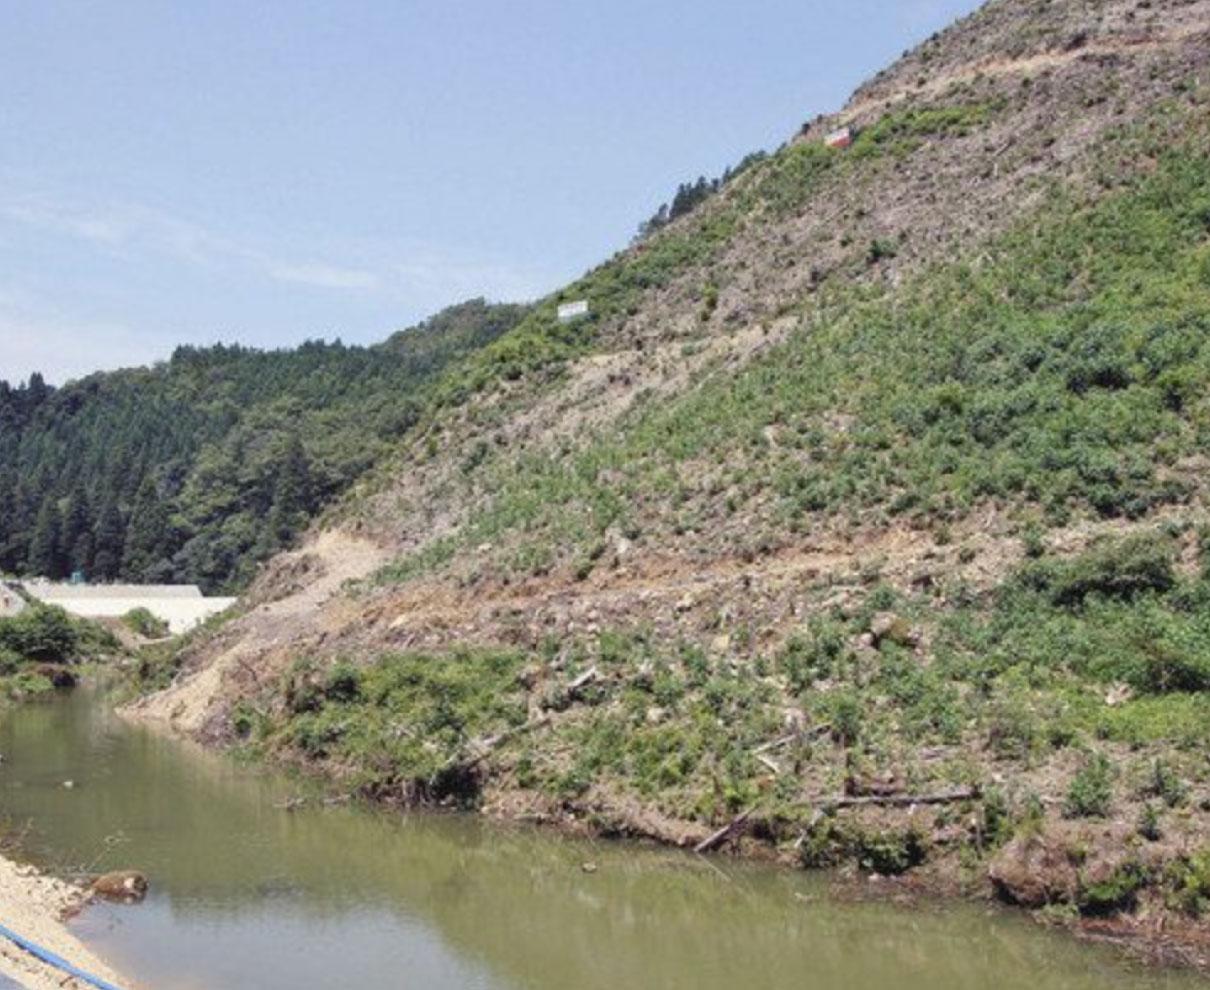 吉野瀬川ダム(越前市) 本体起工 25年度完成へ安全祈願